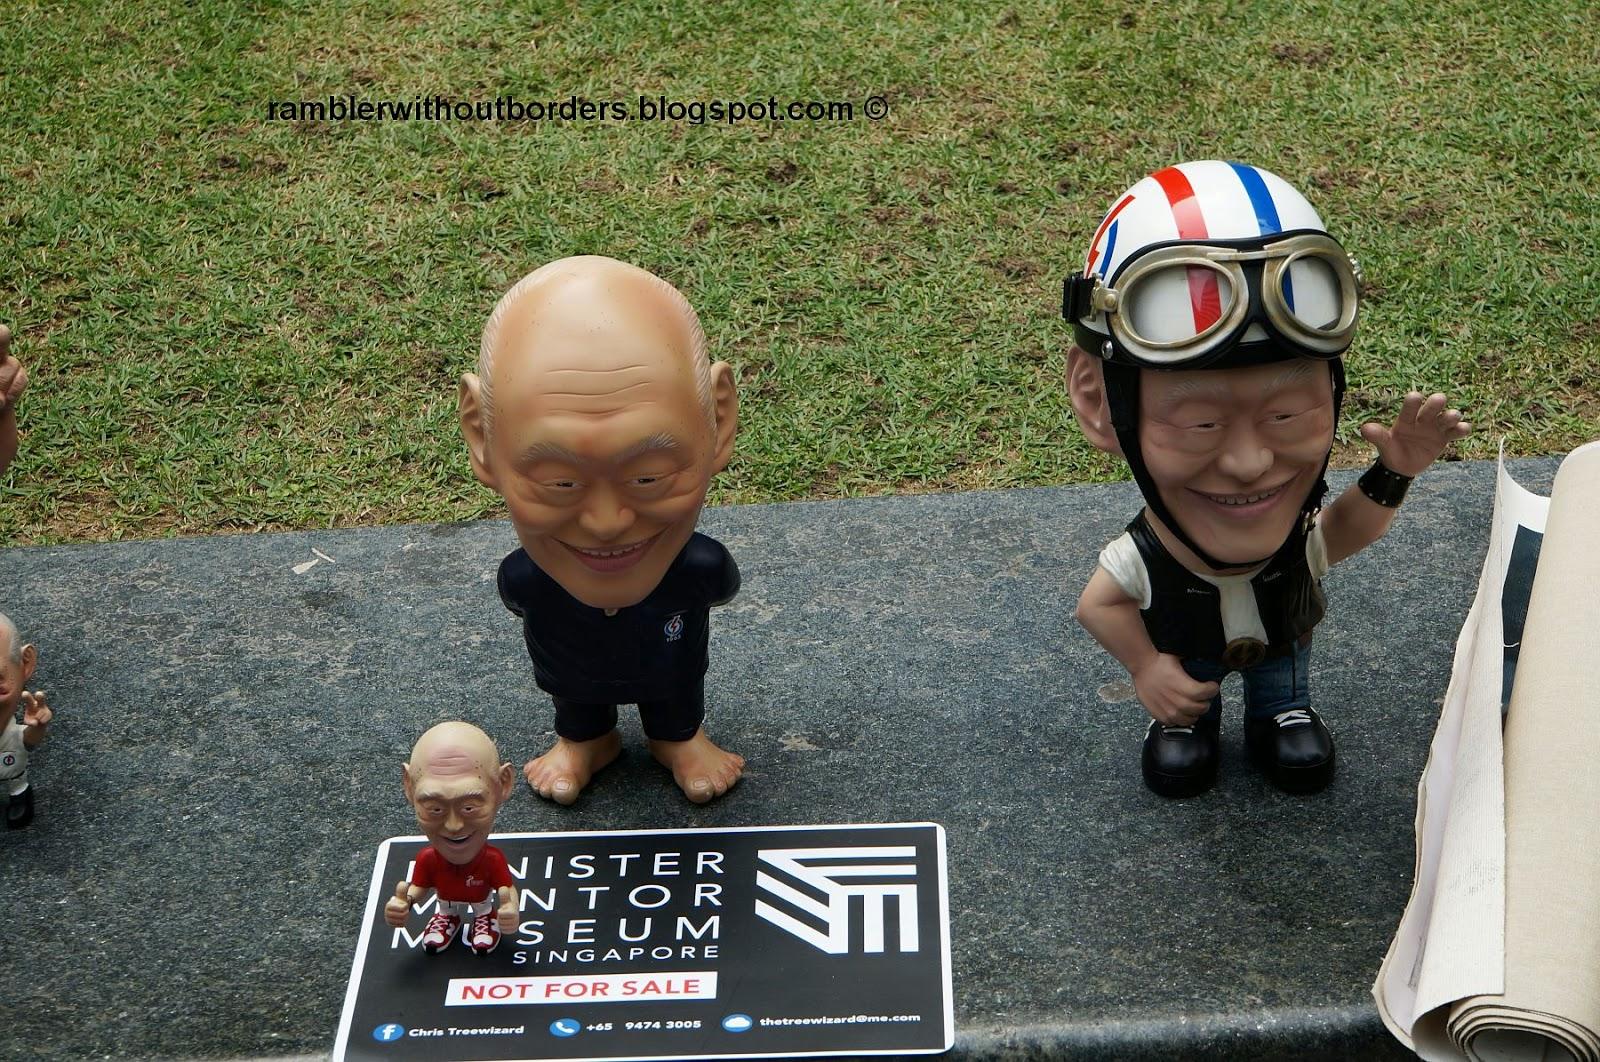 Lee Kwan Ywe figurines, Singapore